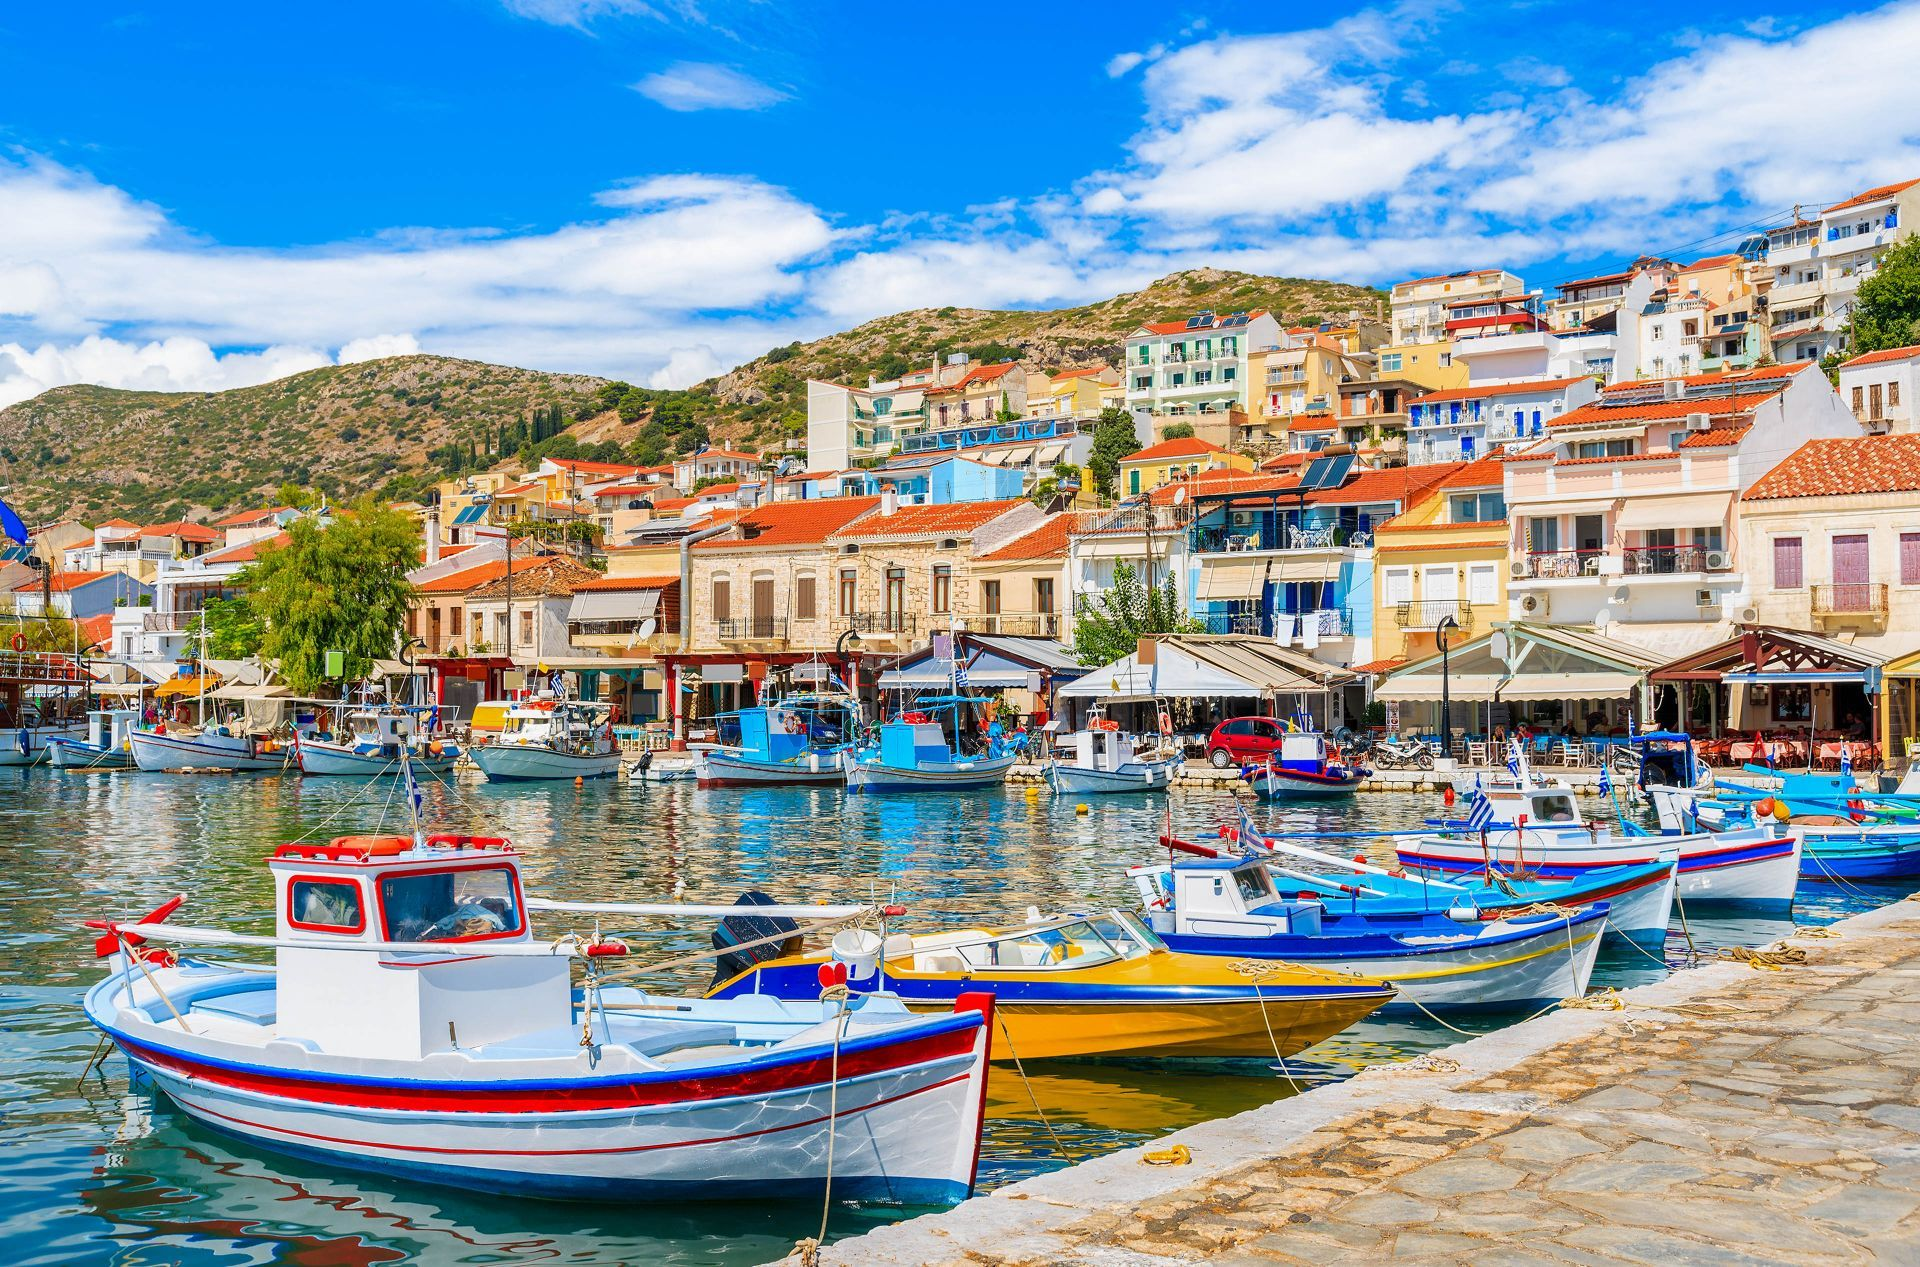 Eastern Aegean islands: Pythagorion in Samos